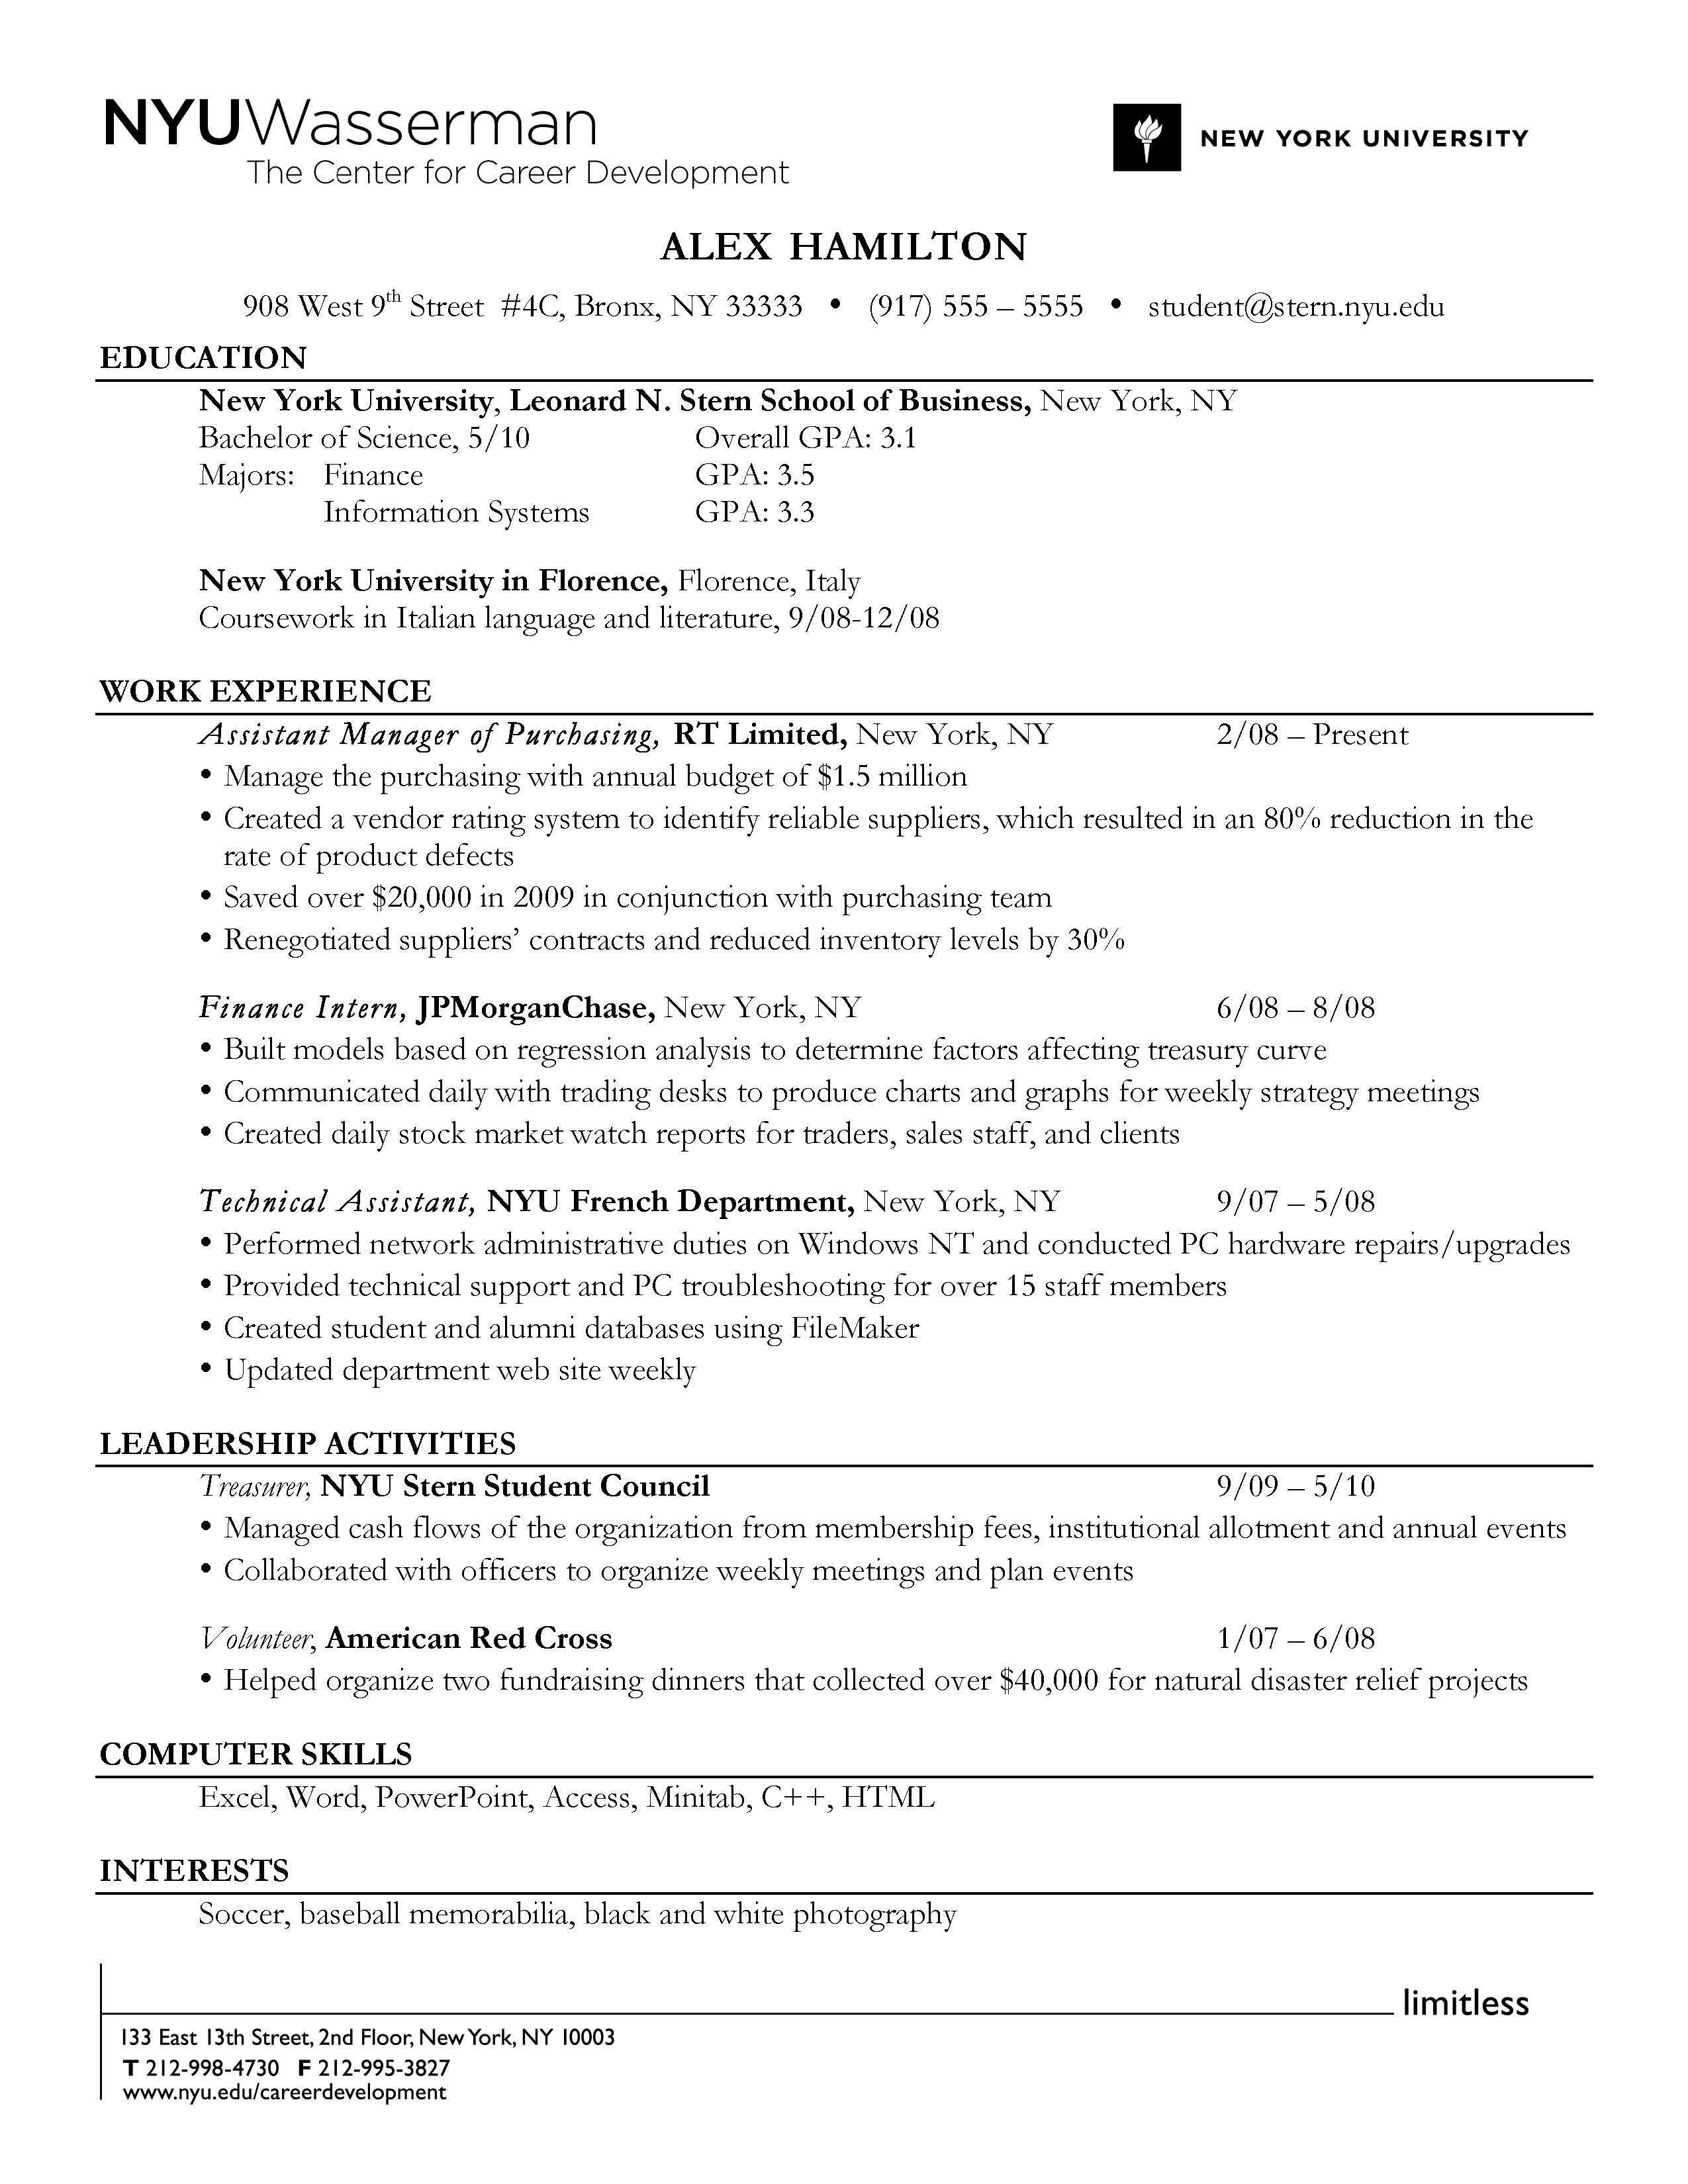 Resume Format Highlighting Experience Resume Format Resume Format Chronological Resume Resume